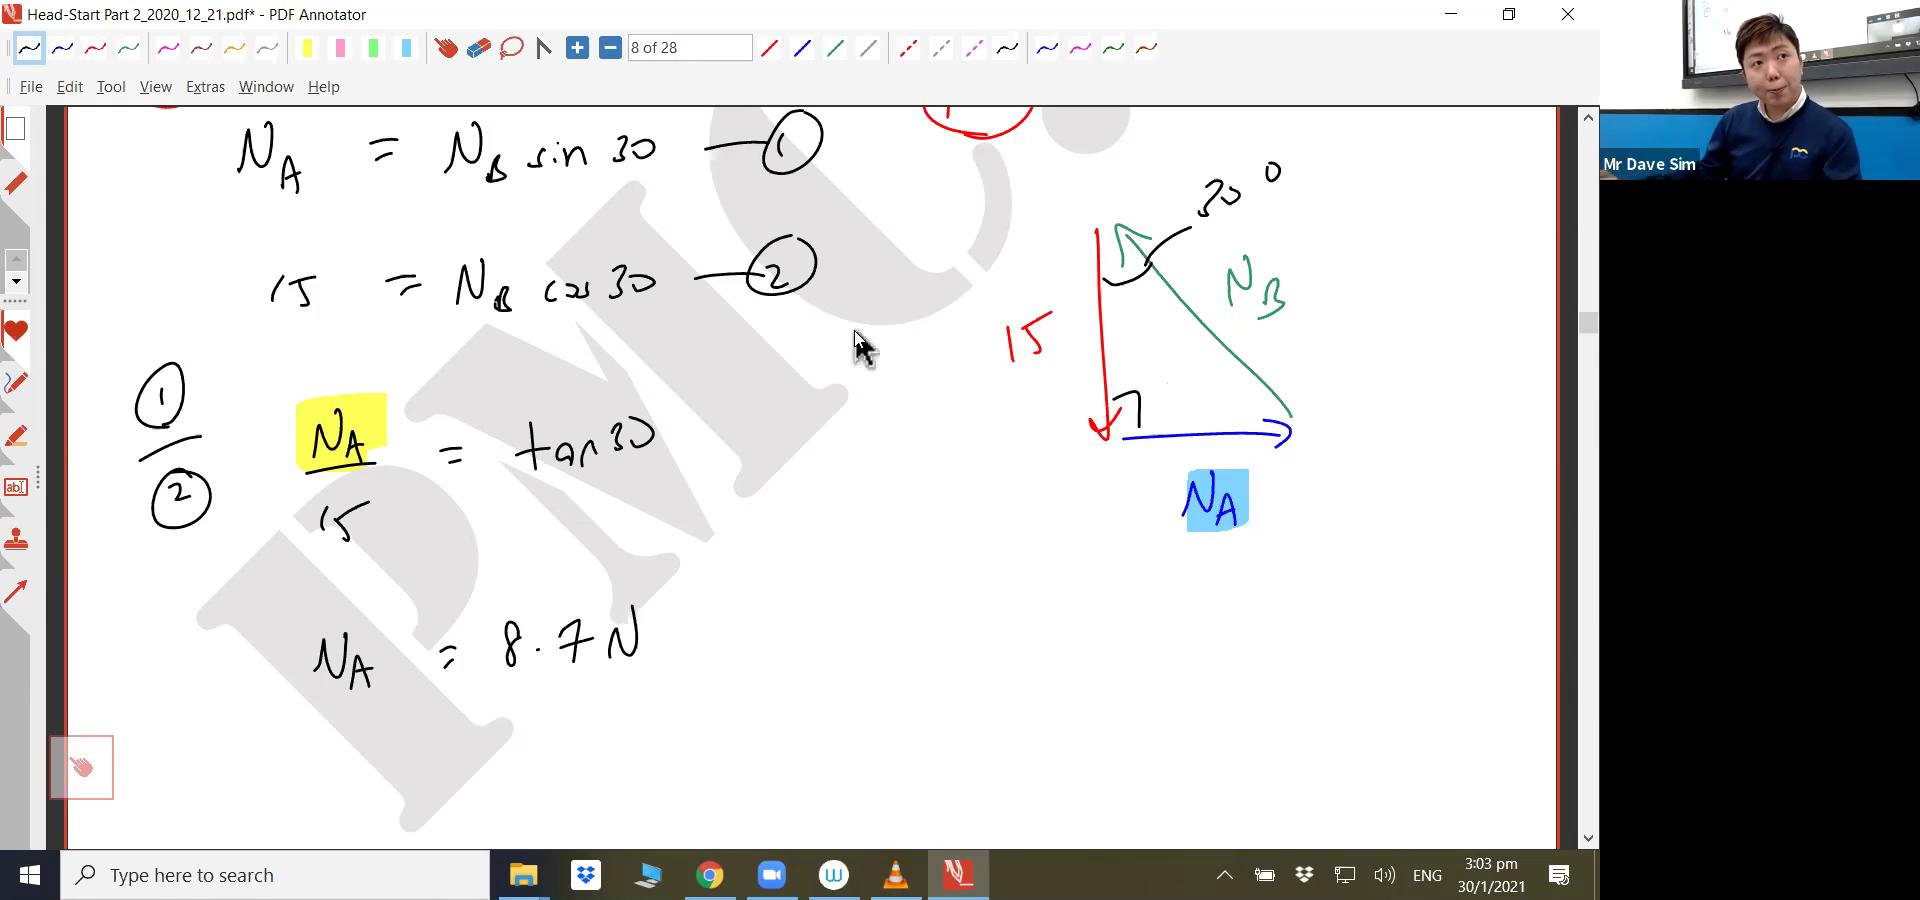 [JC HEADSTART] Projectile Motion, Forces, Dynamics